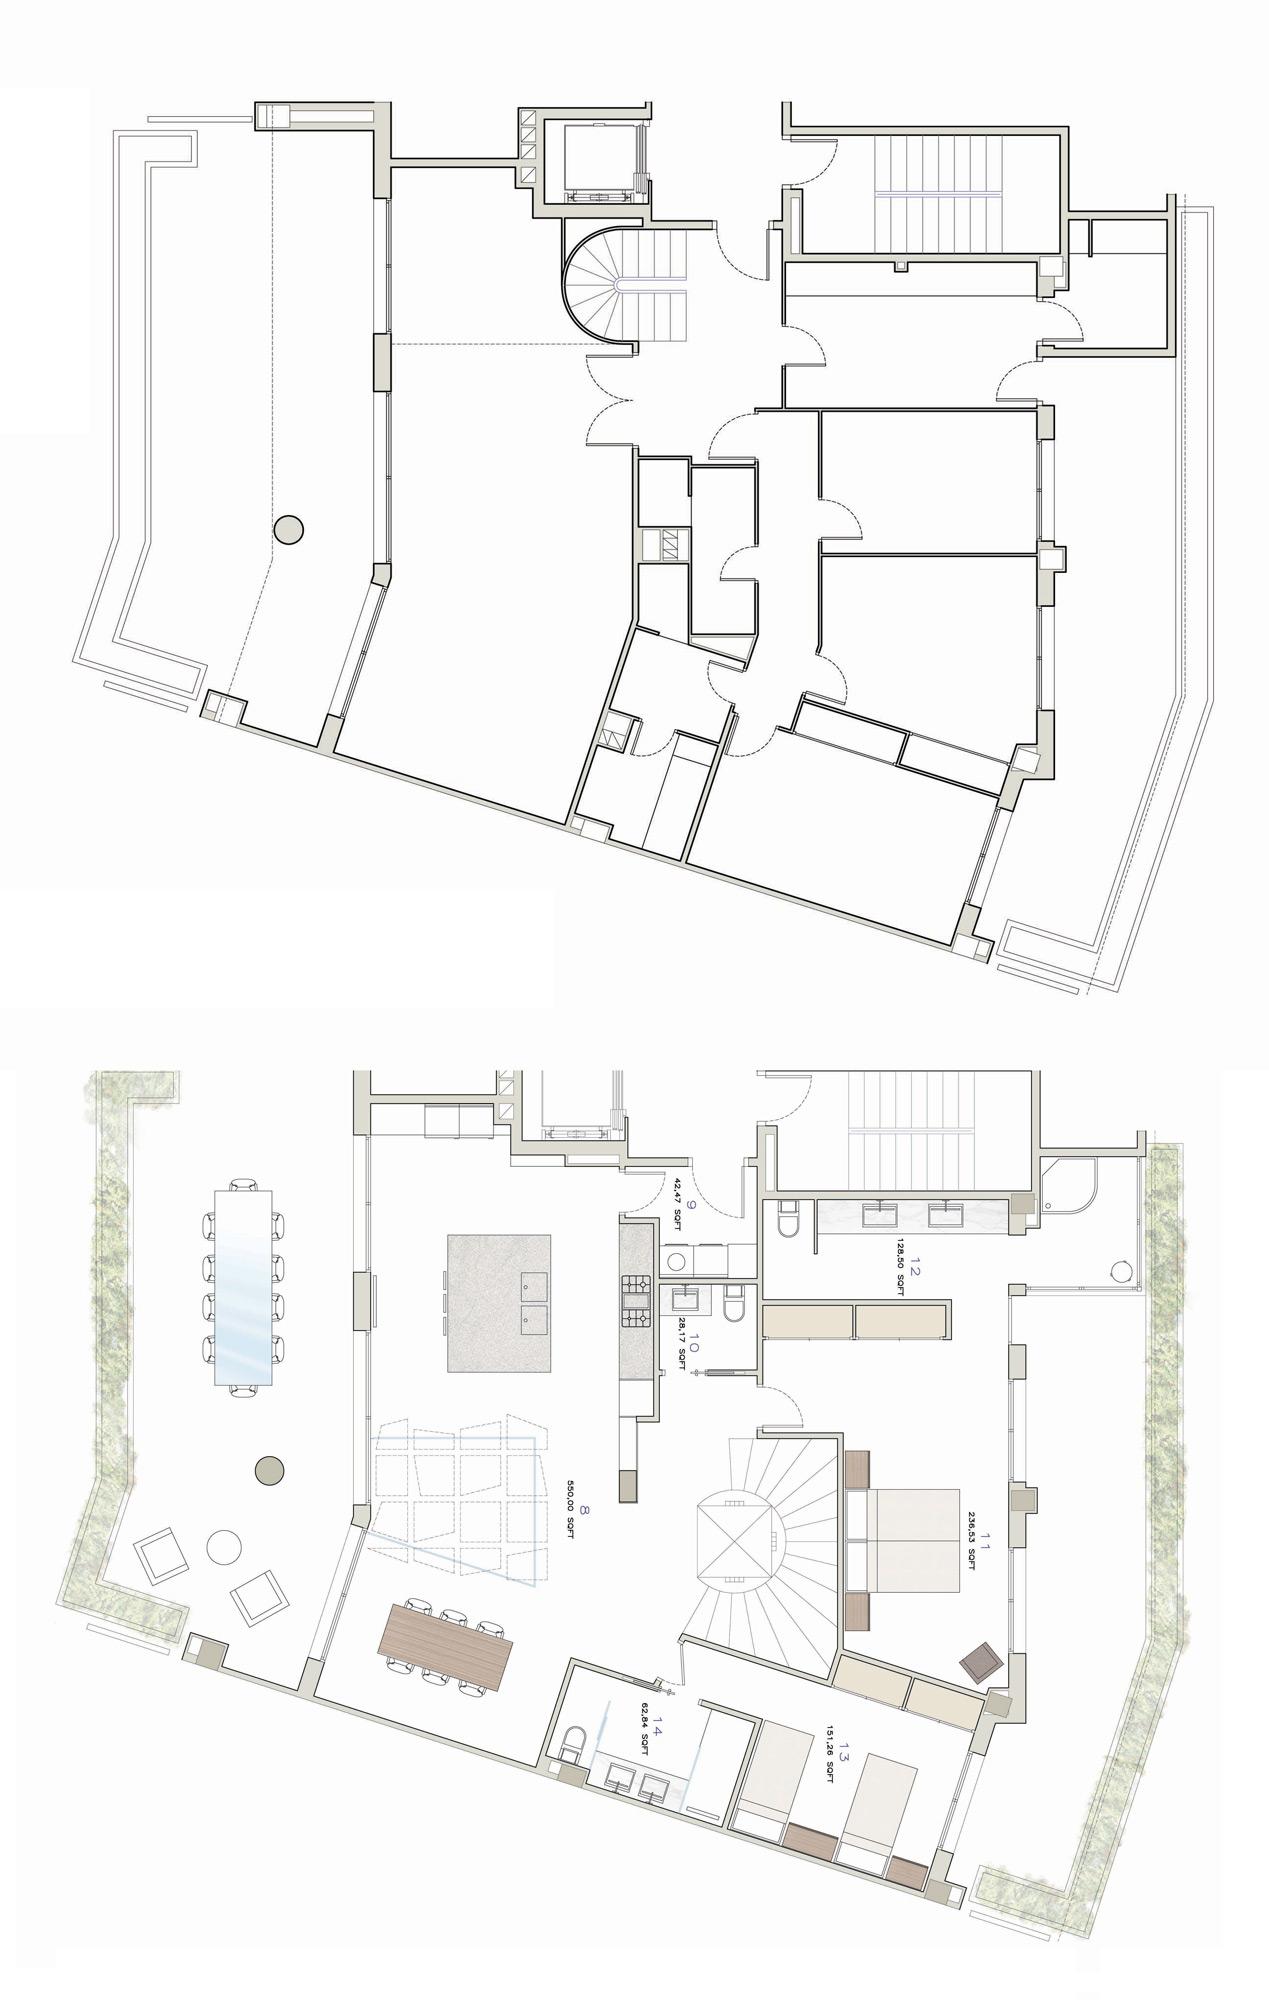 Arquitectura e dise o interior en barcelona y sitges - Planos de arquitectos ...